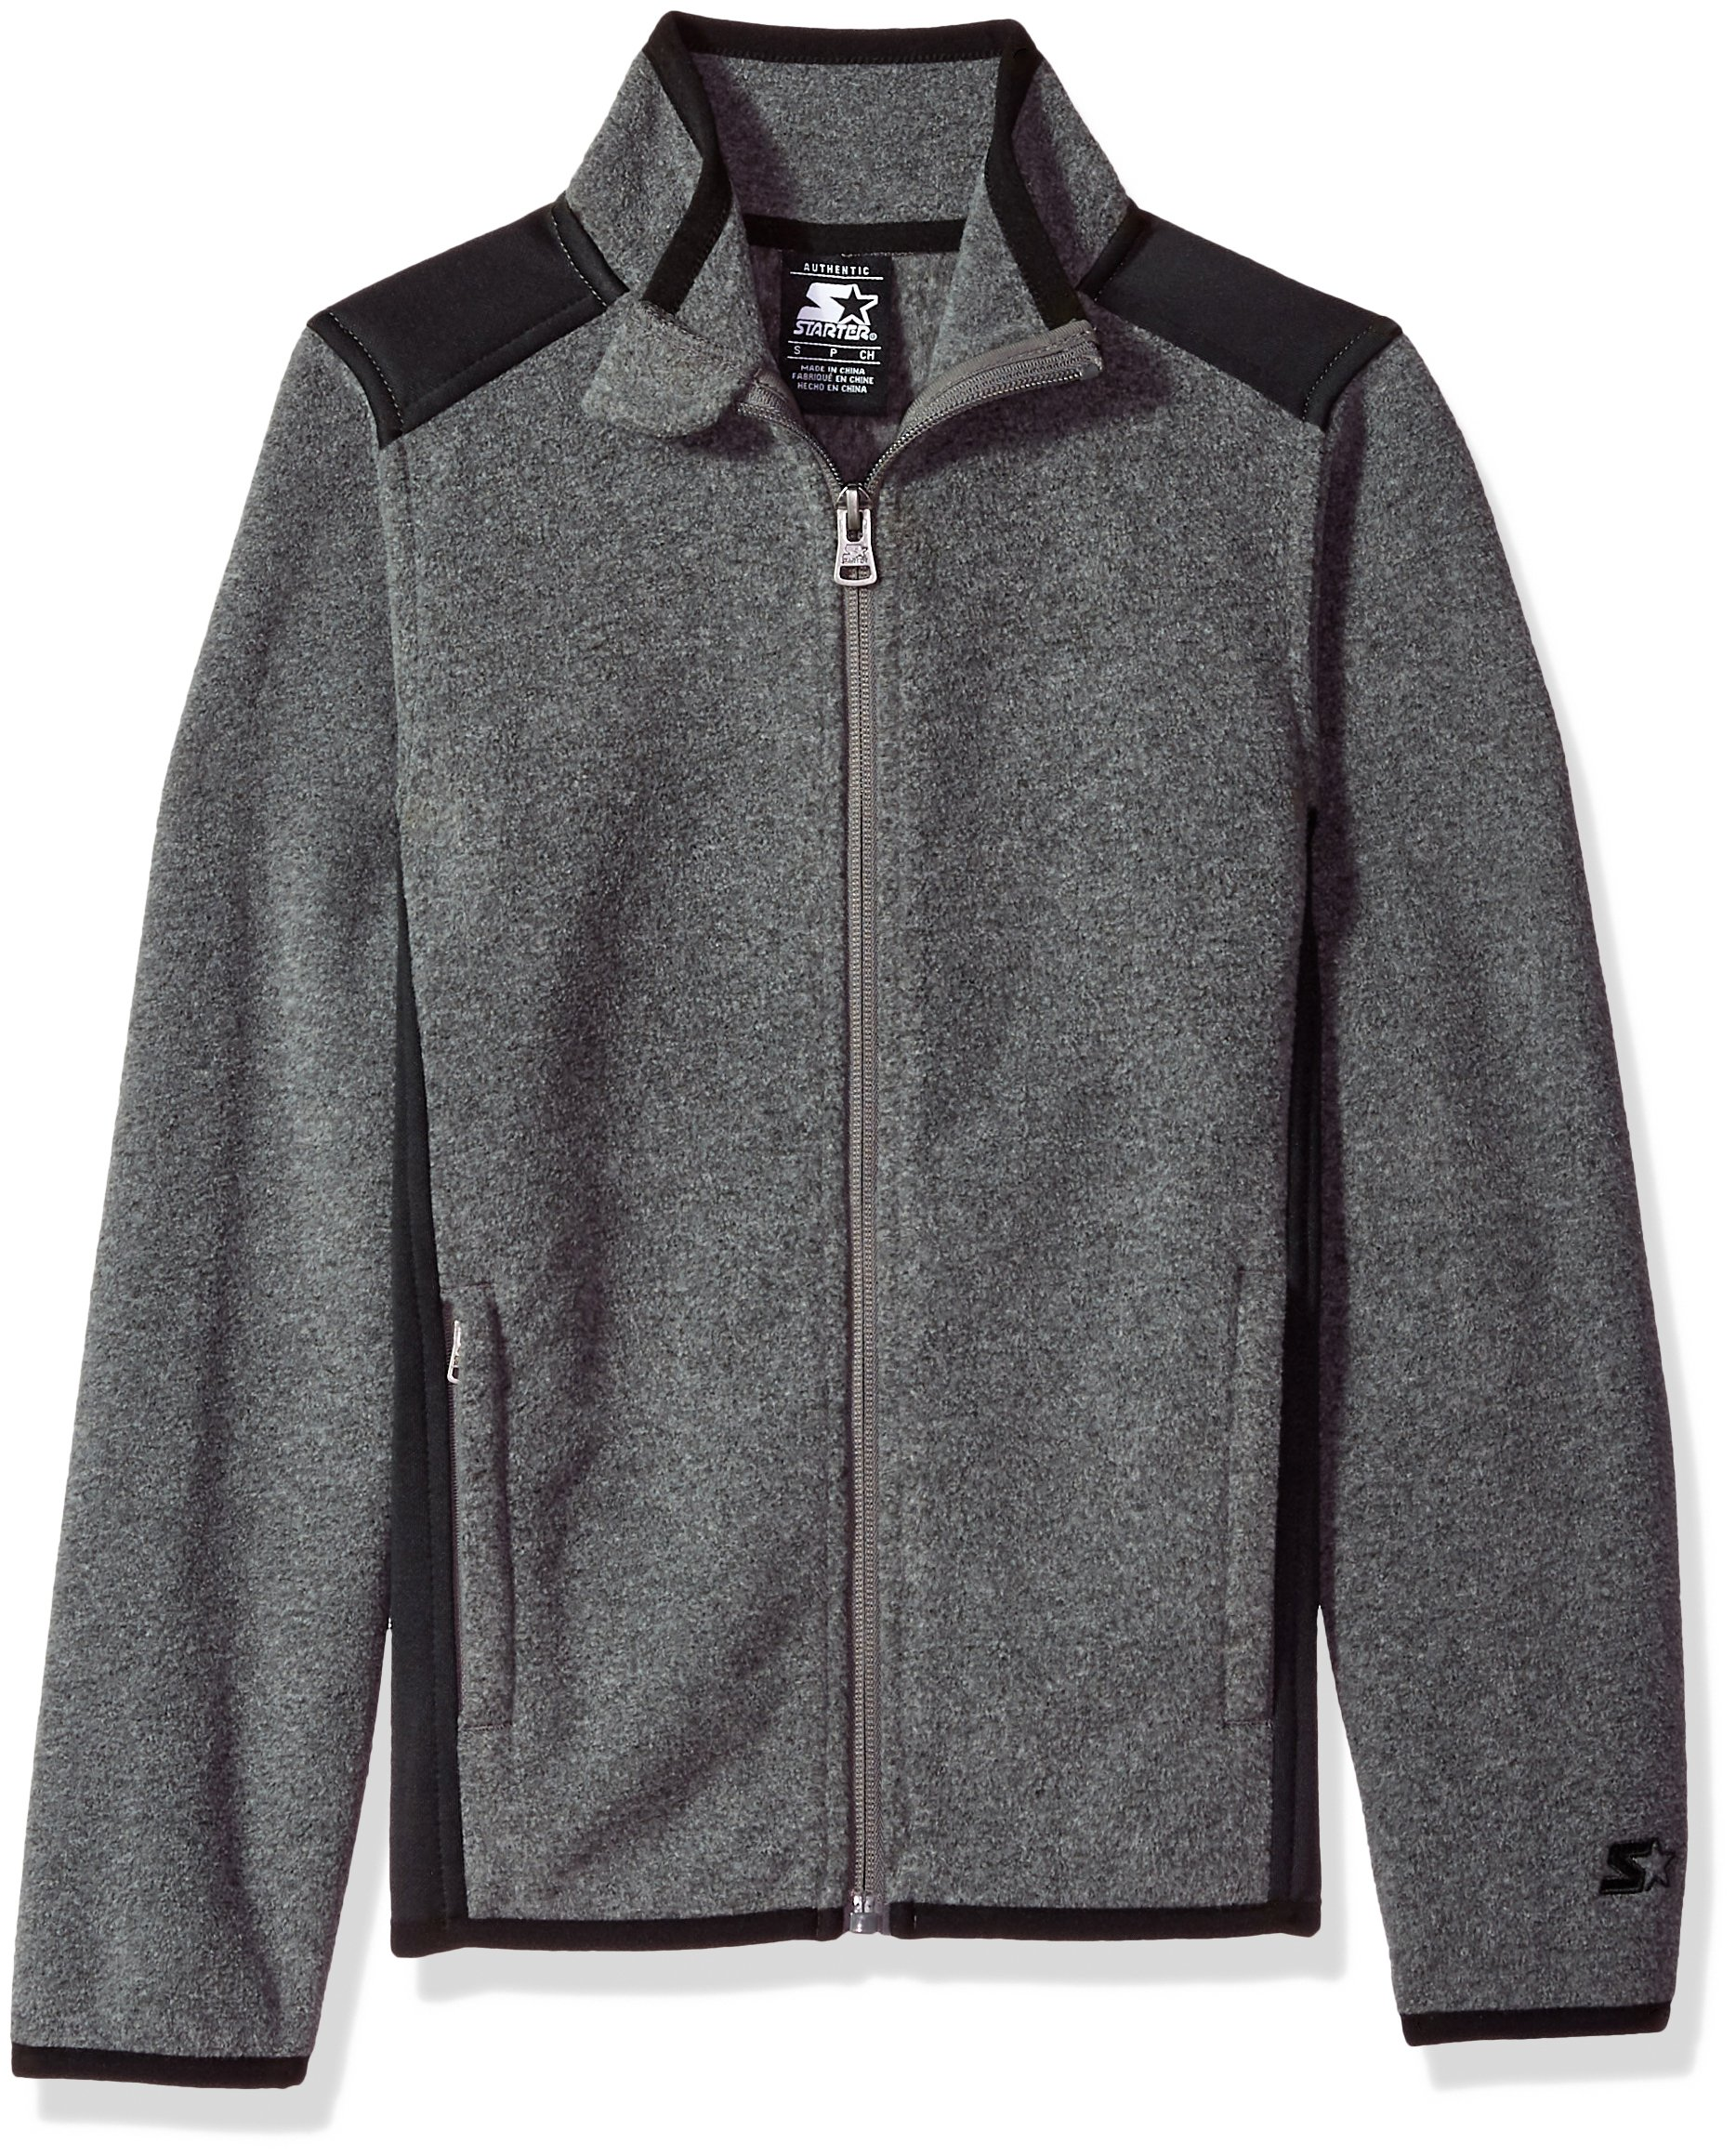 Starter Girls Polar Fleece Jacket Exclusive